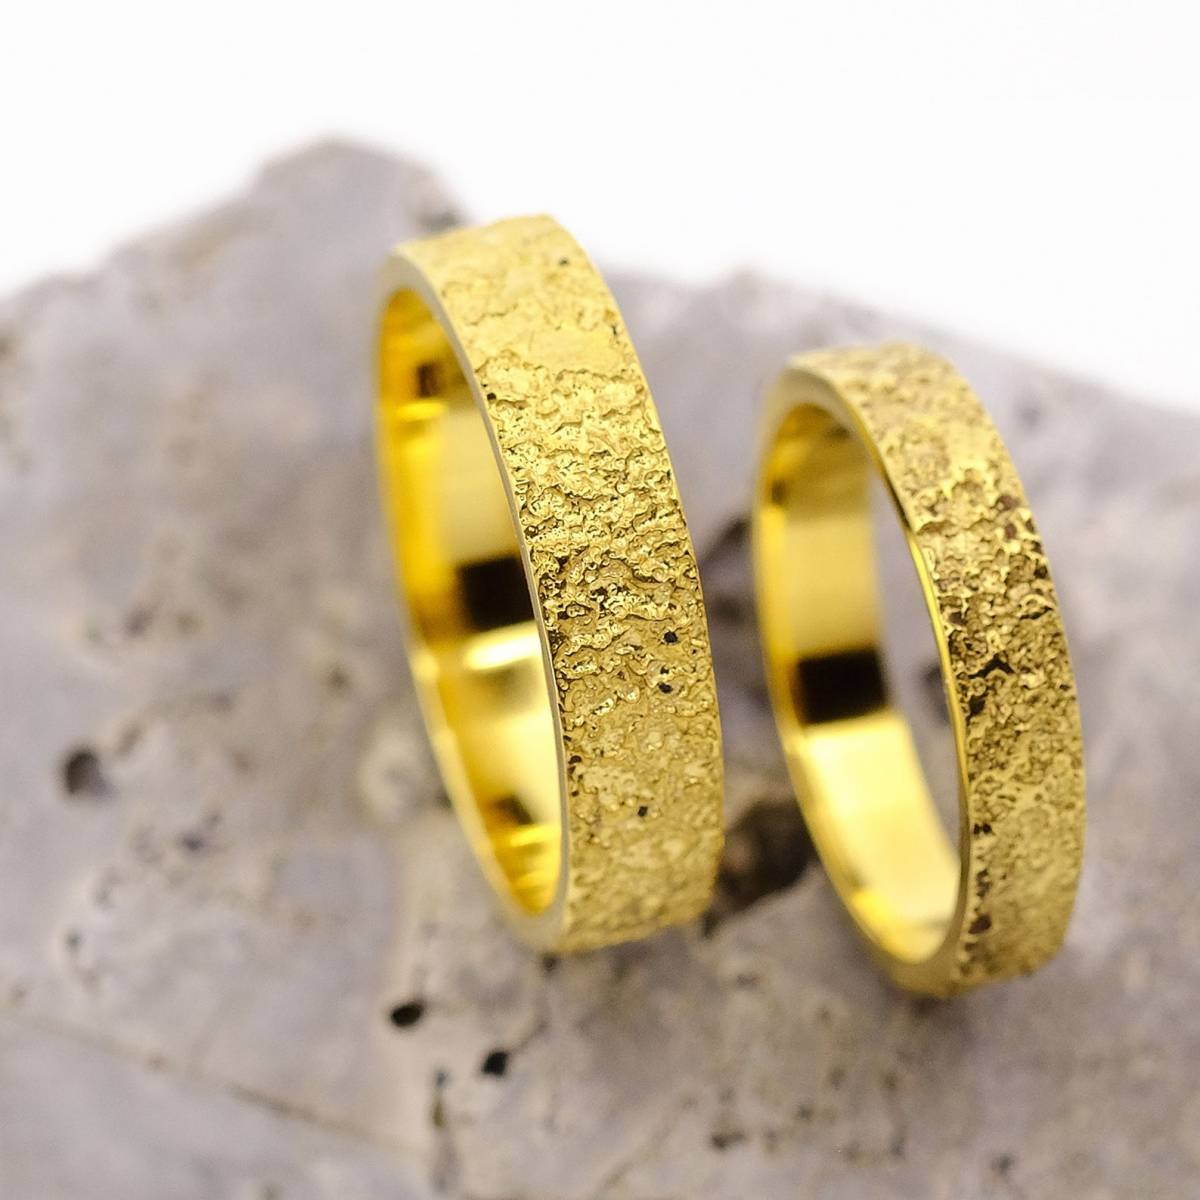 Jonas Maes Jewels - Juwelen - Bruidsjuwelen - Verlovingsring - Trouwring - House of Weddings - 4